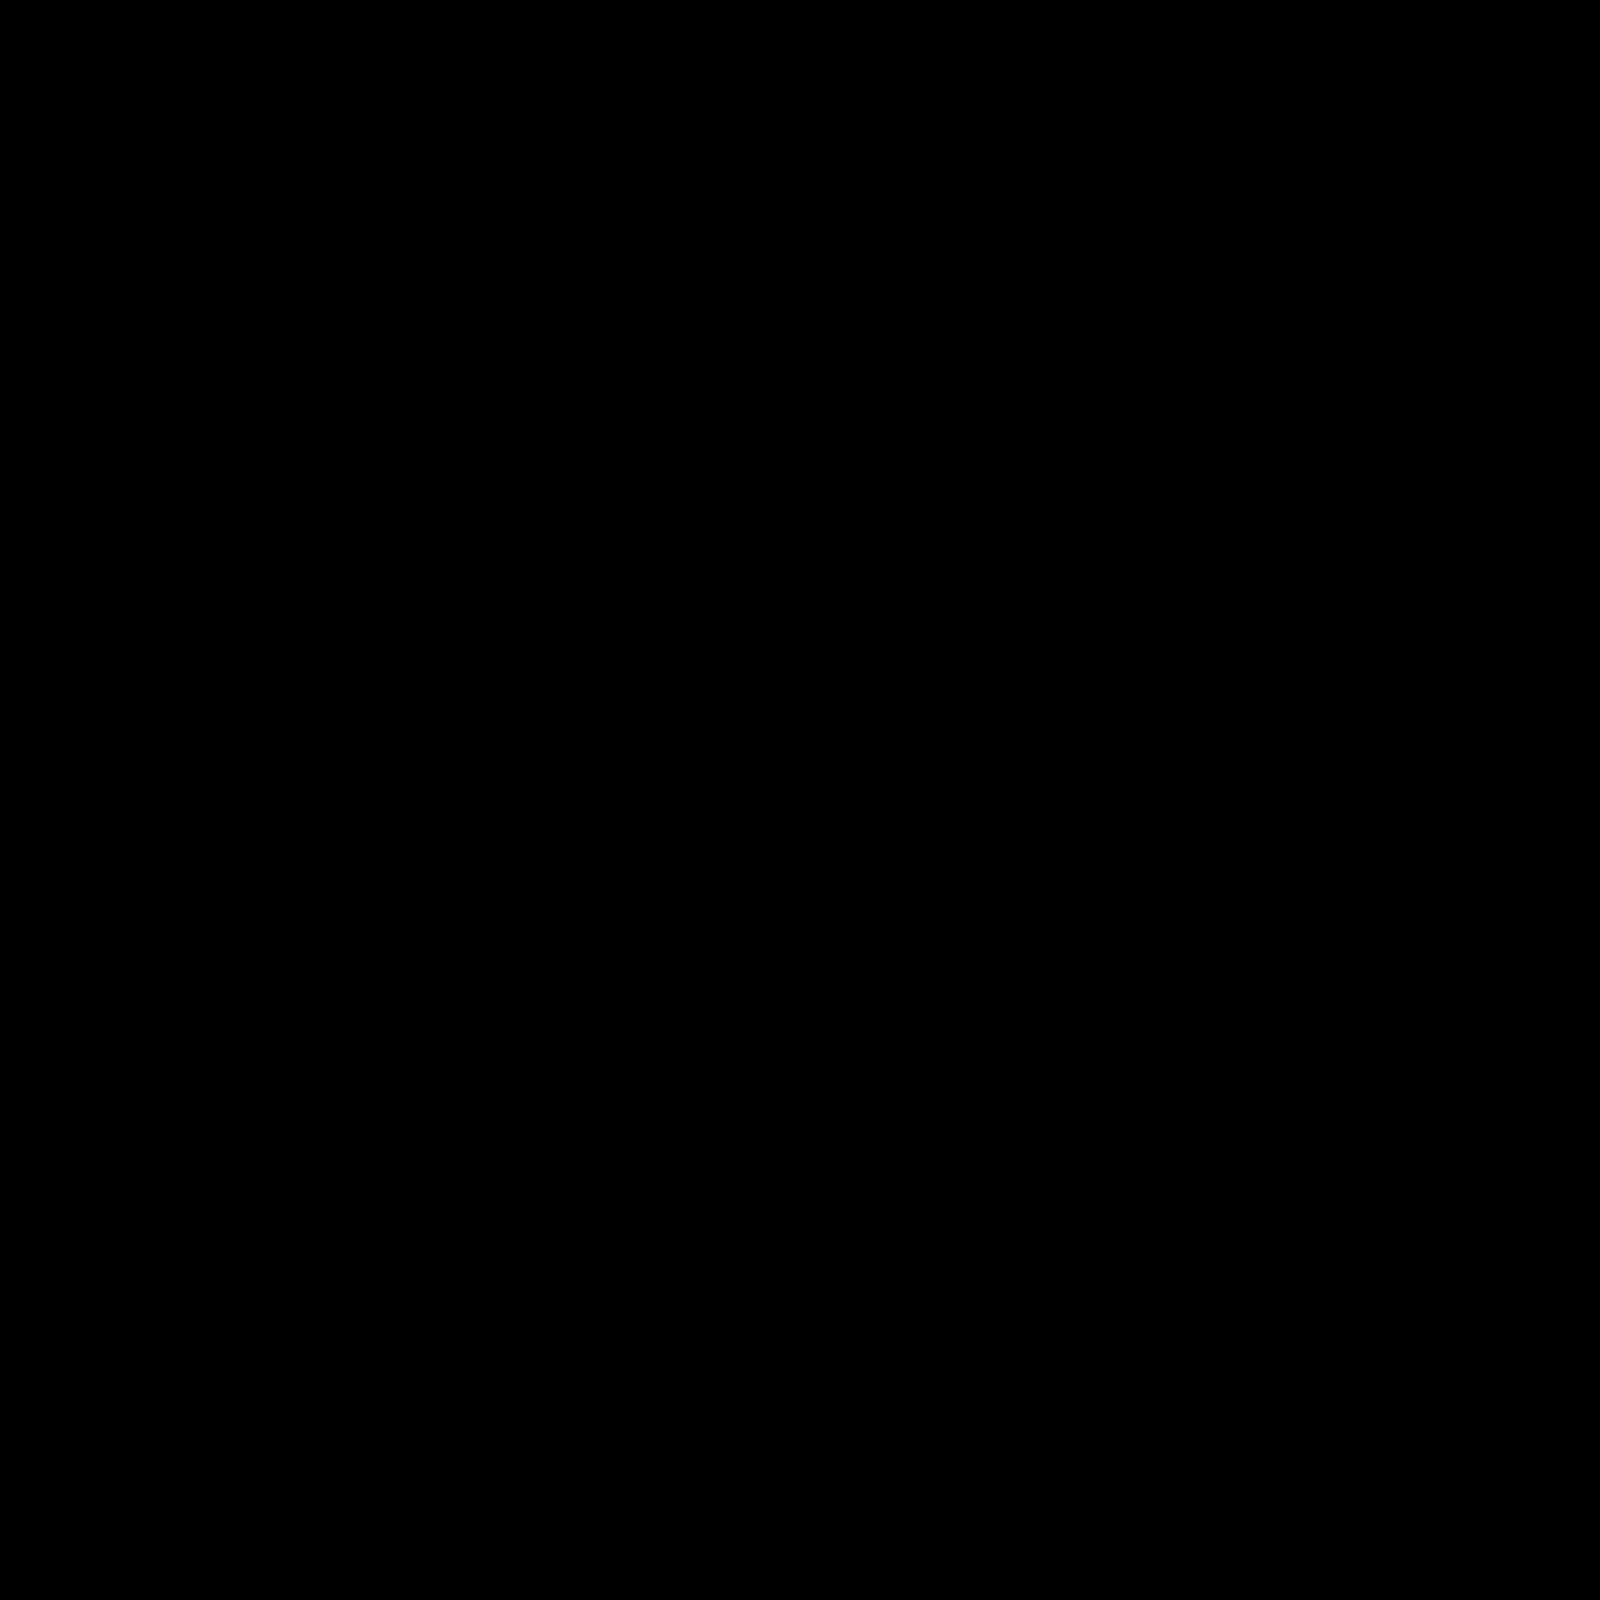 丸 2 icon. This is a picture of the number two. The number two has been circled with a circle that is about a half an inch away from the number in all directions.